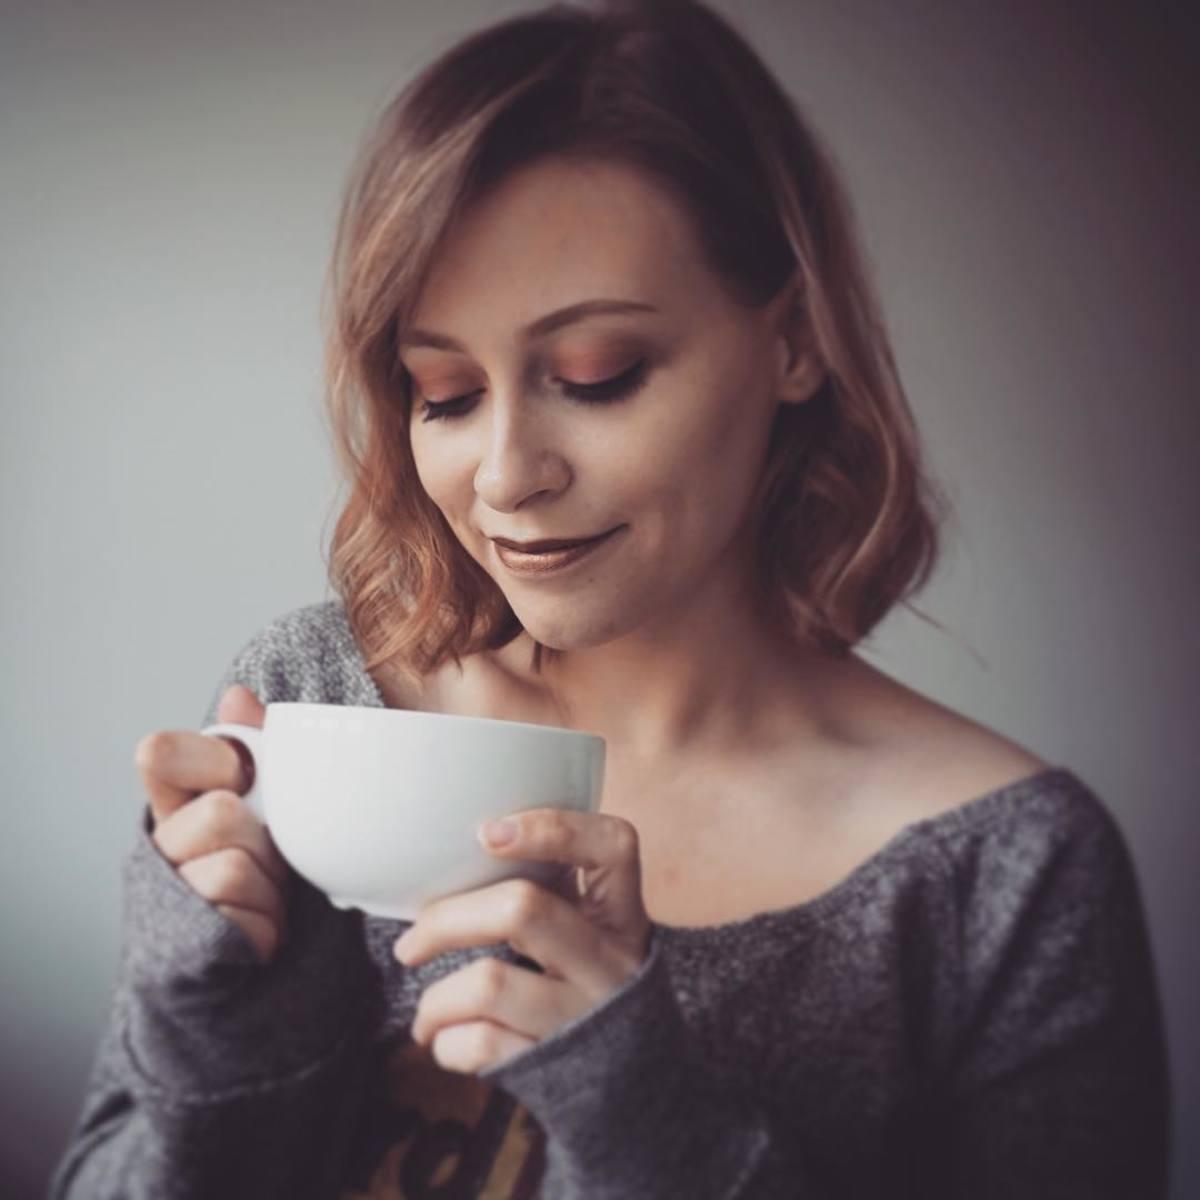 Thaila Skye holding tea mug